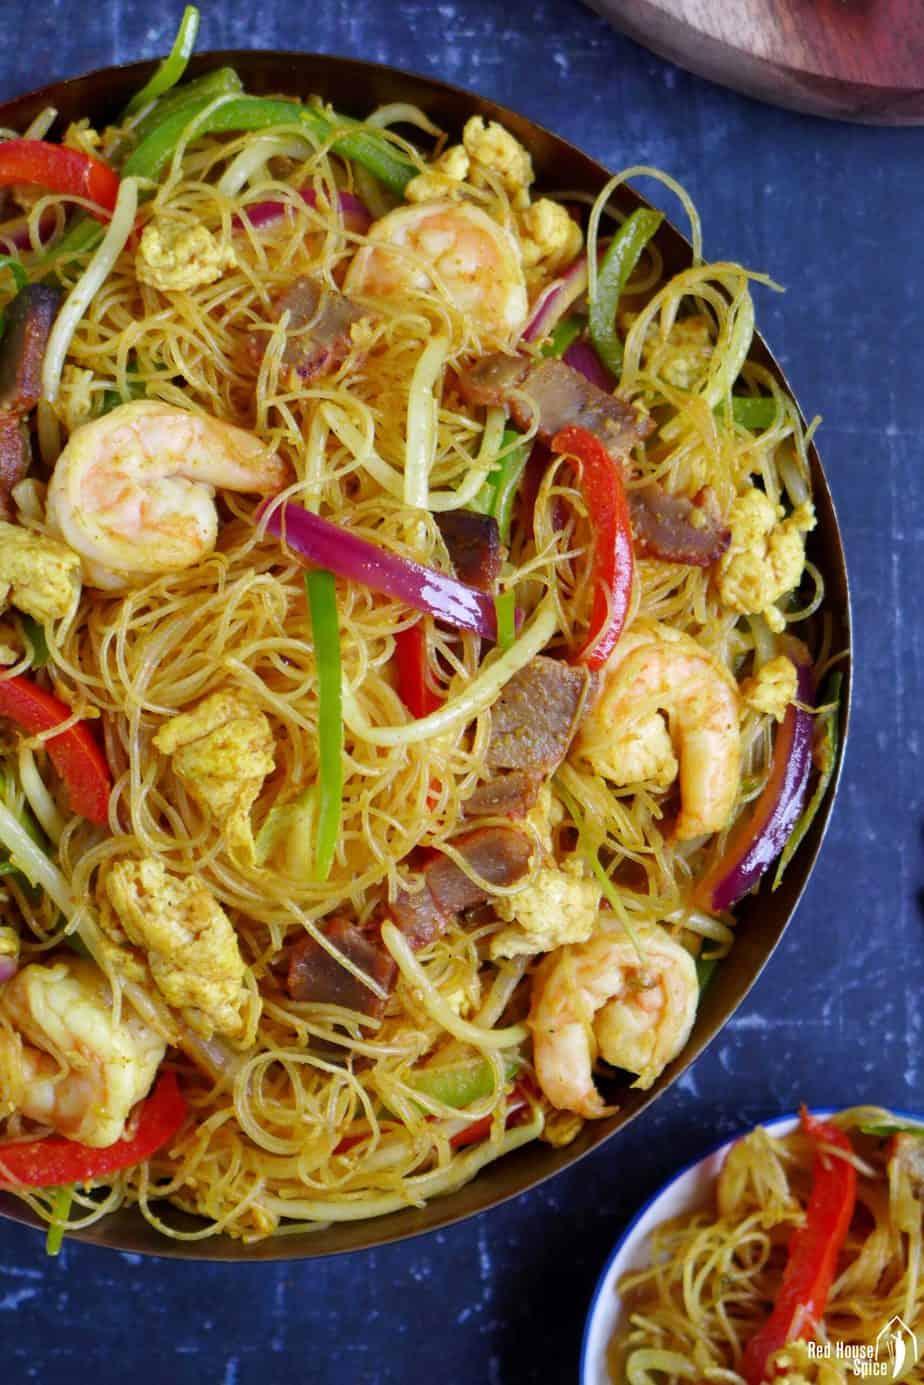 Stir-fried rice noodles with meat & vegetables.